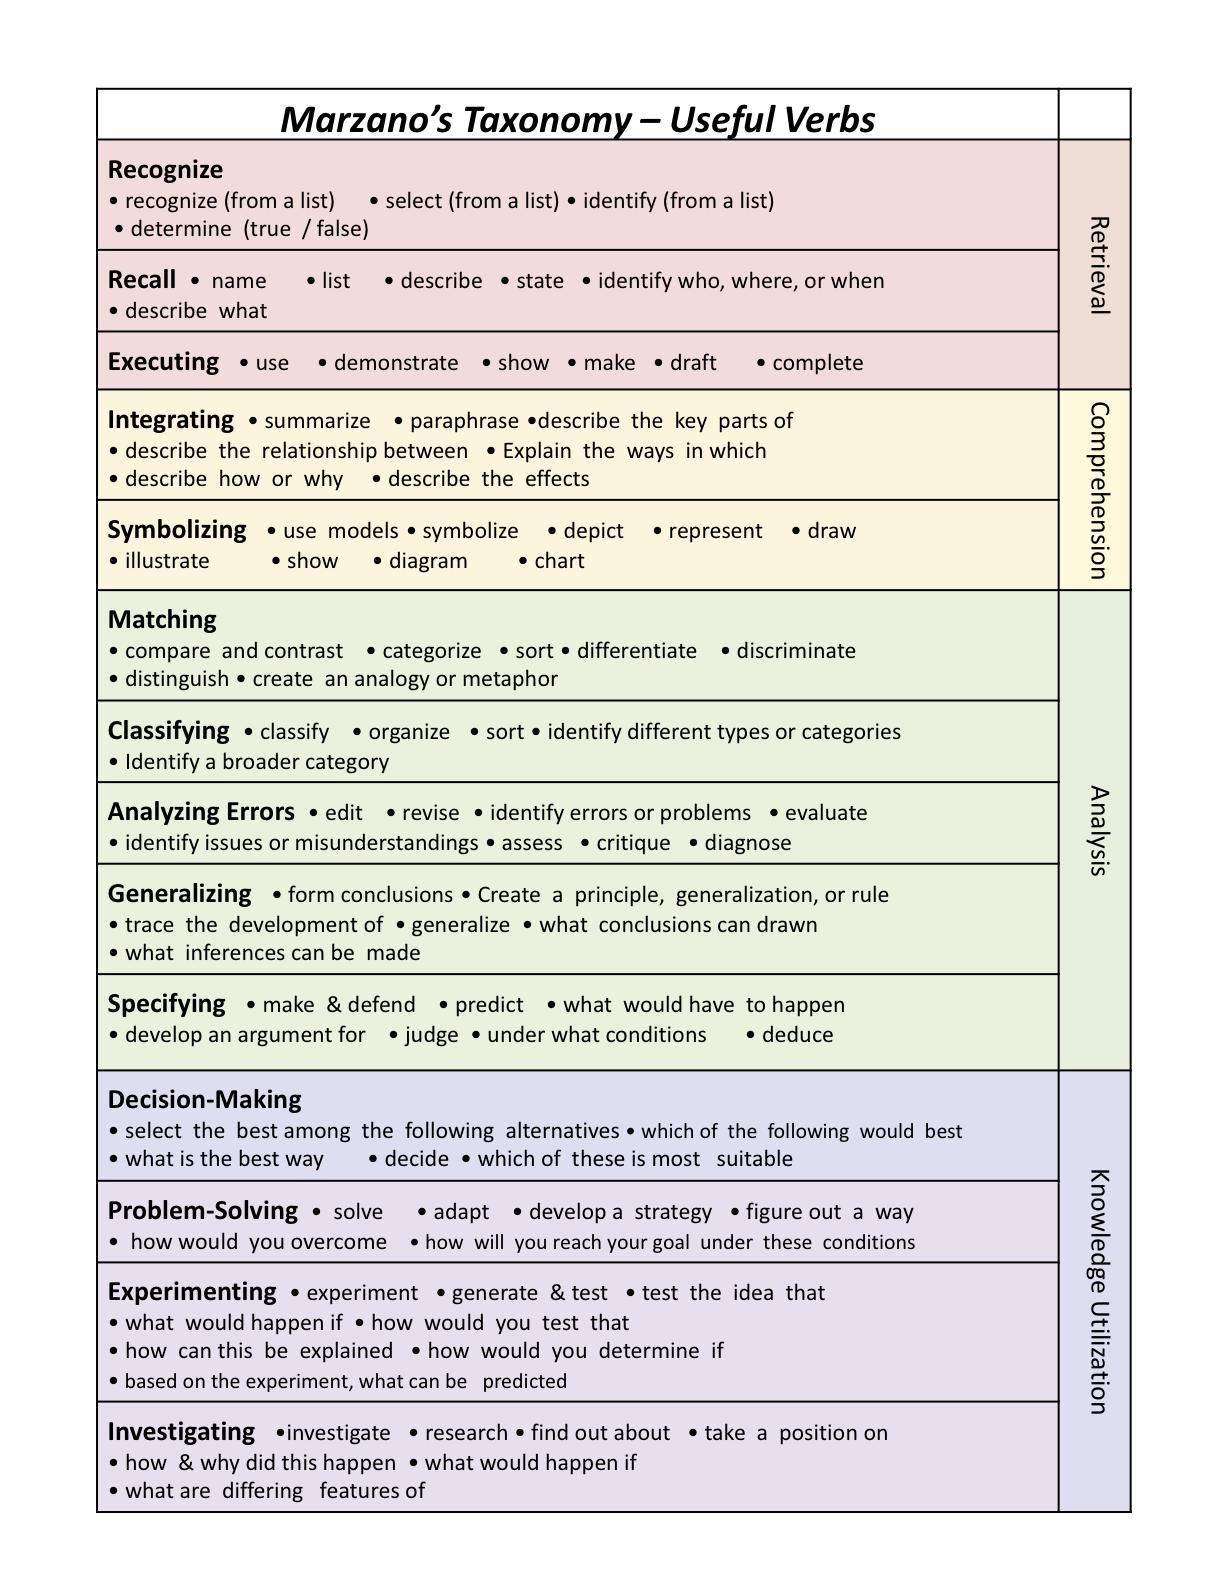 Marzano Taxonomy And Useful Verbs